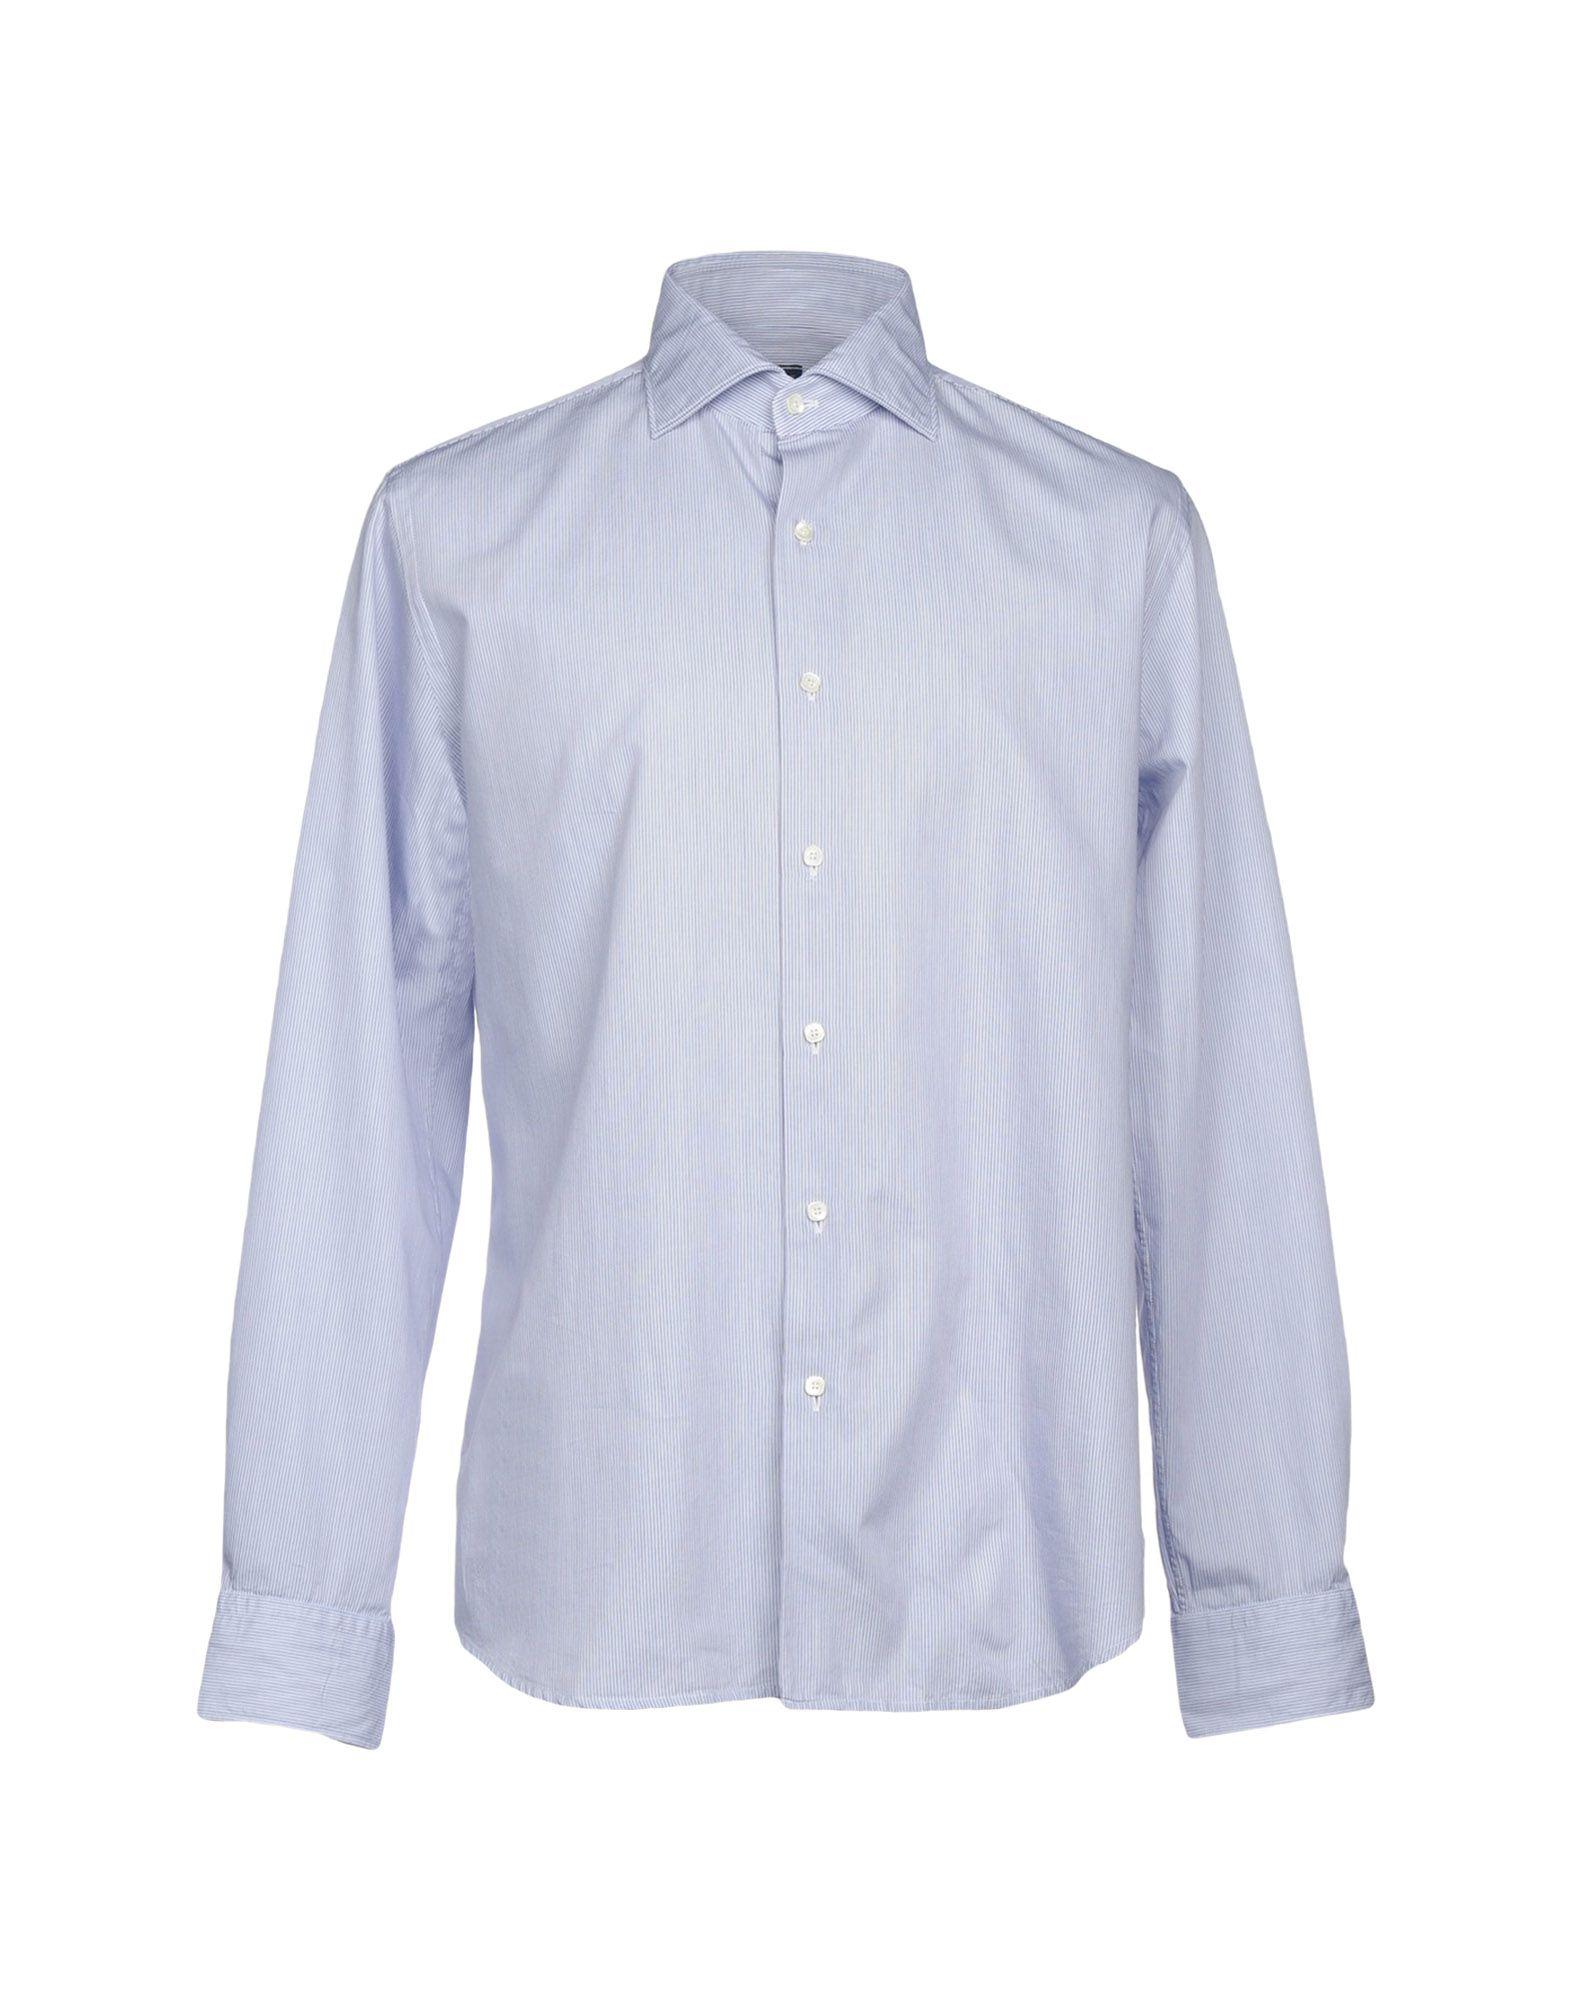 XACUS Herren Hemd Farbe Himmelblau Größe 9